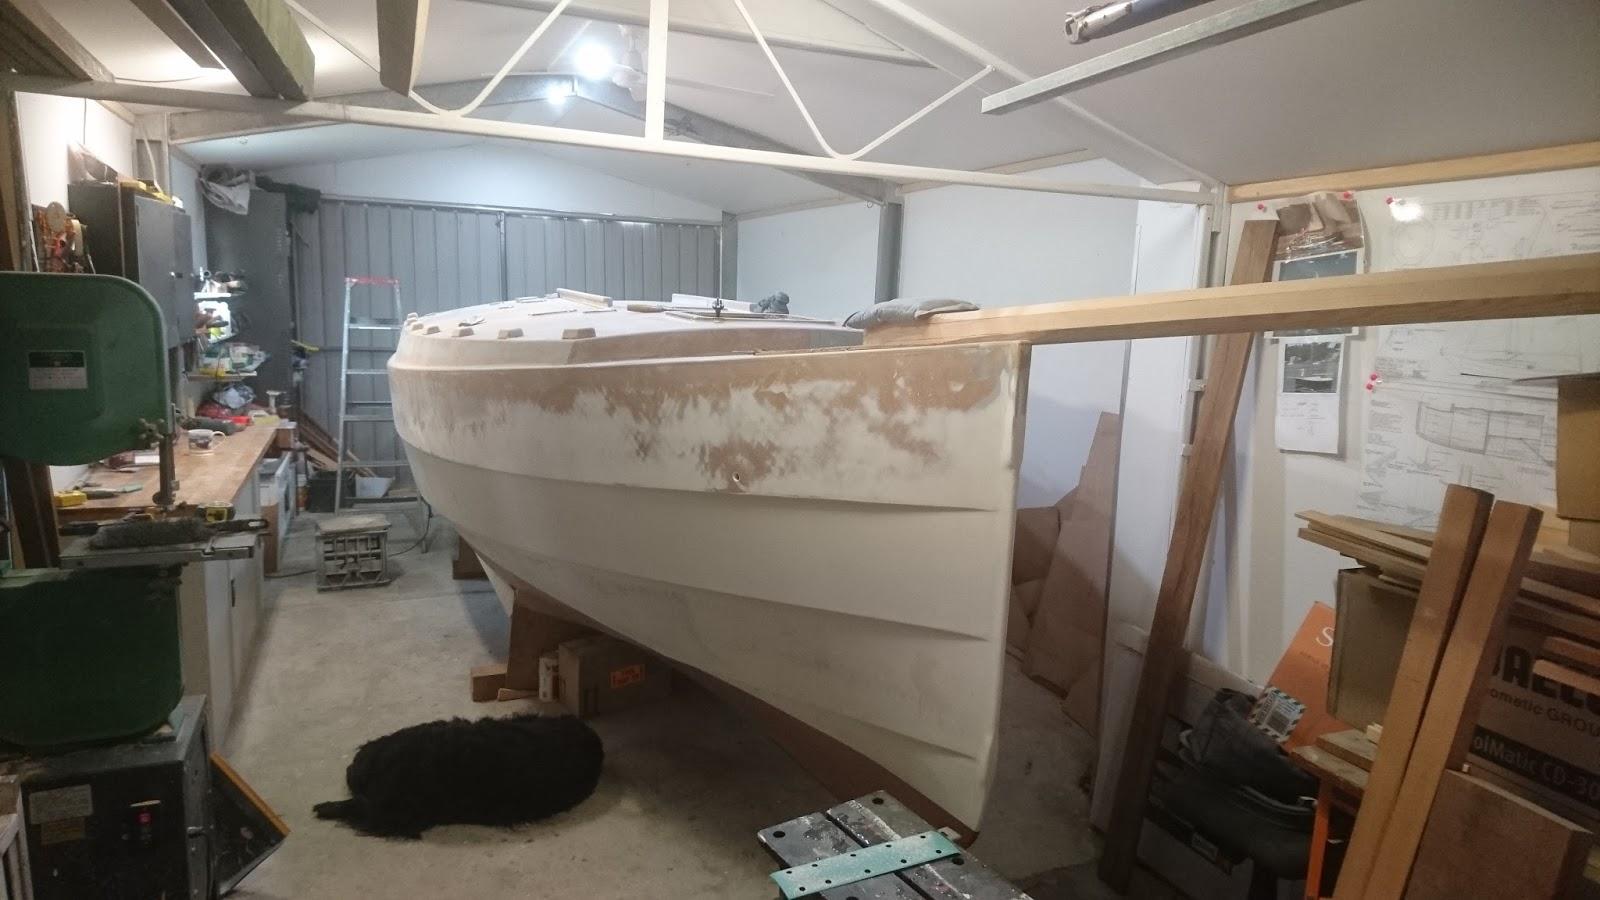 Dudley dix yacht design Richard woods designs